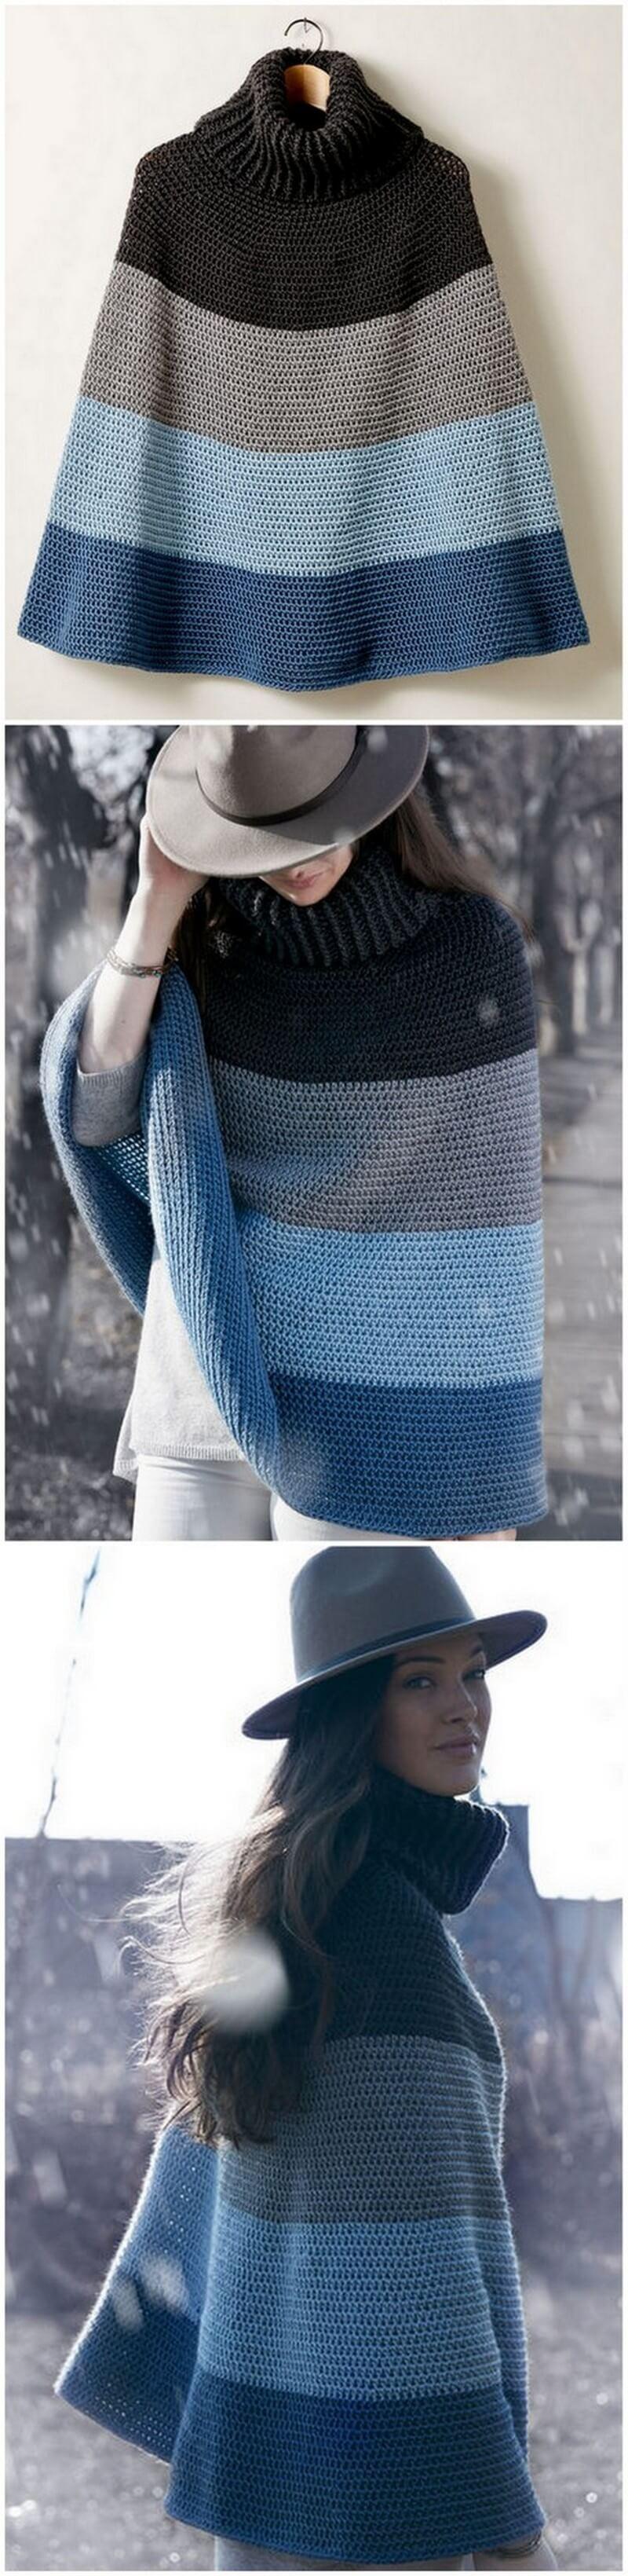 Crochet Poncho Pattern (1)